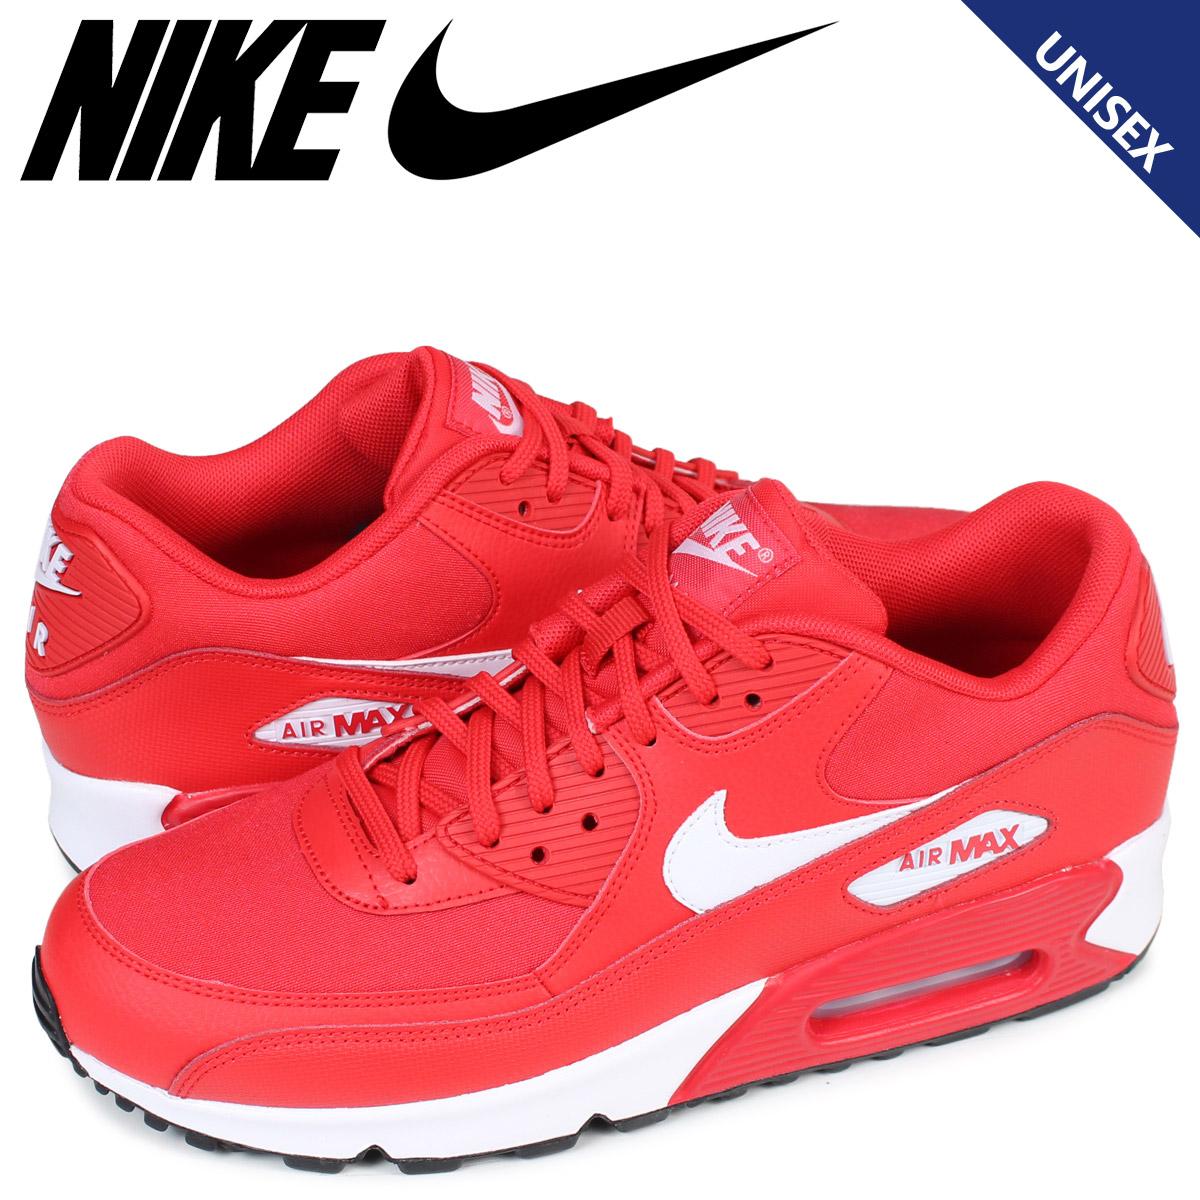 Nike Air Max 90 325213 612 Damen Rot